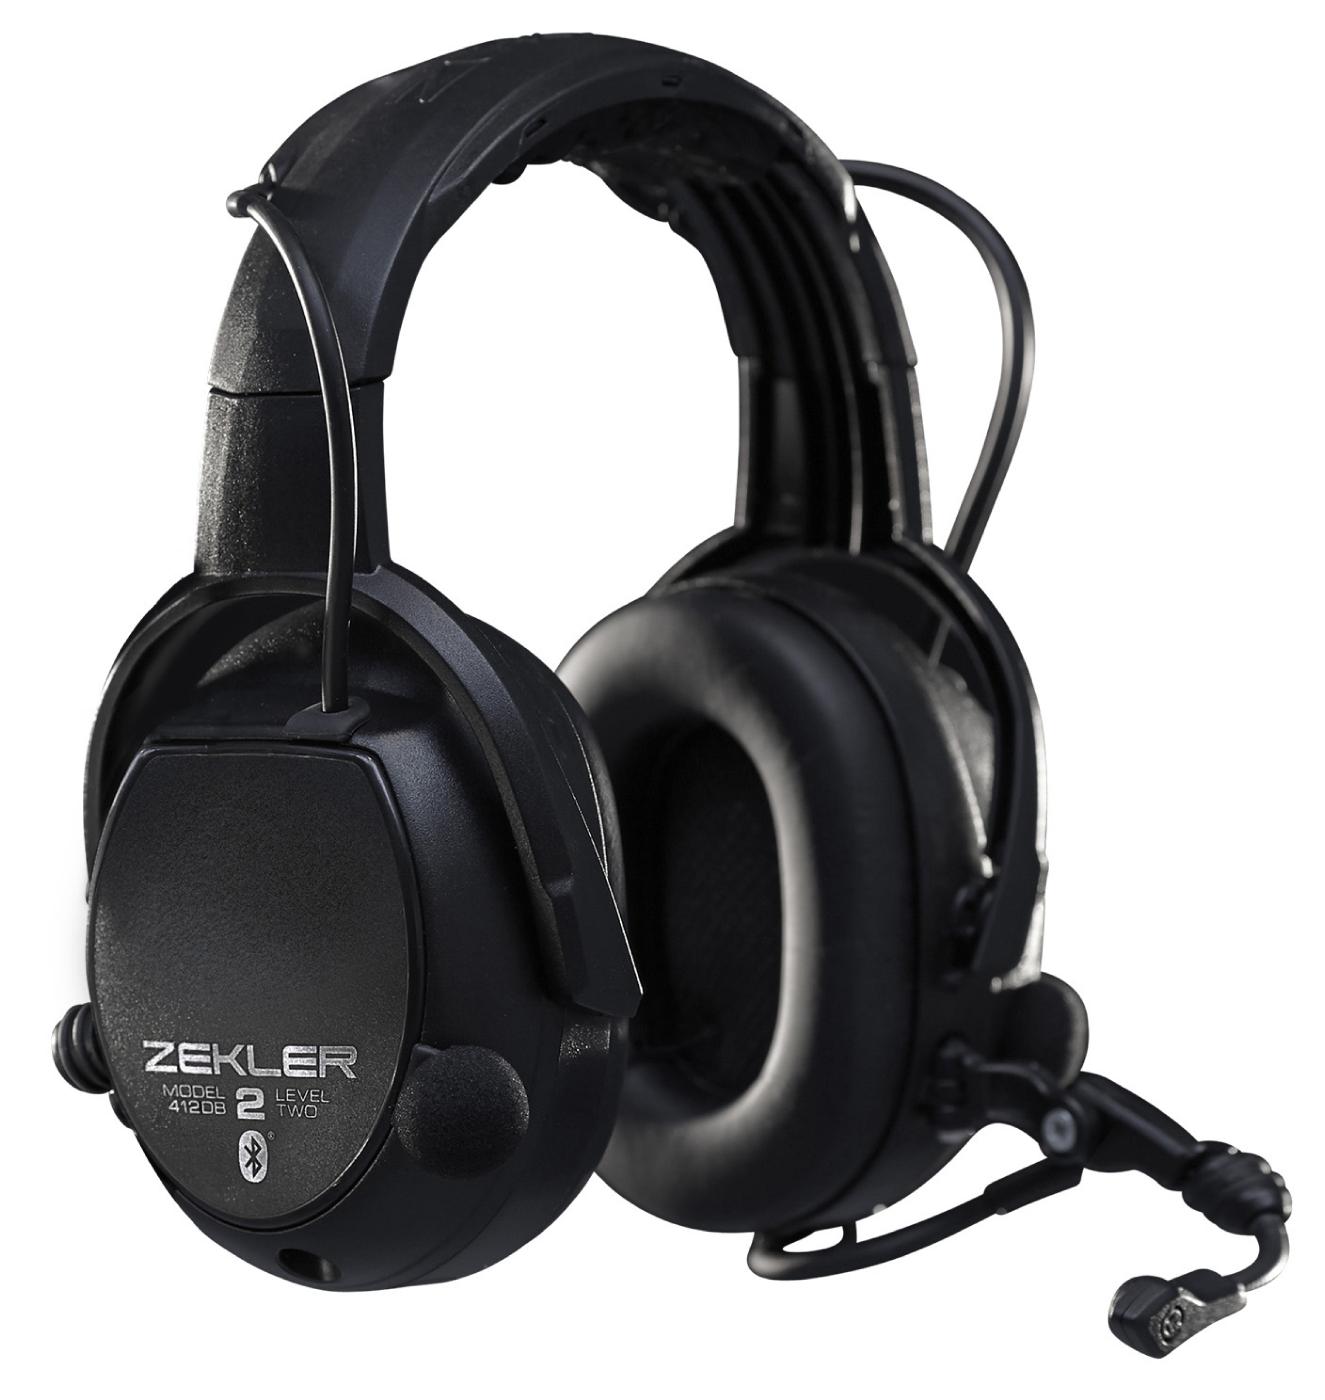 Zekler gehoorbescherming - bluetooth - FM radio - Level dependent system